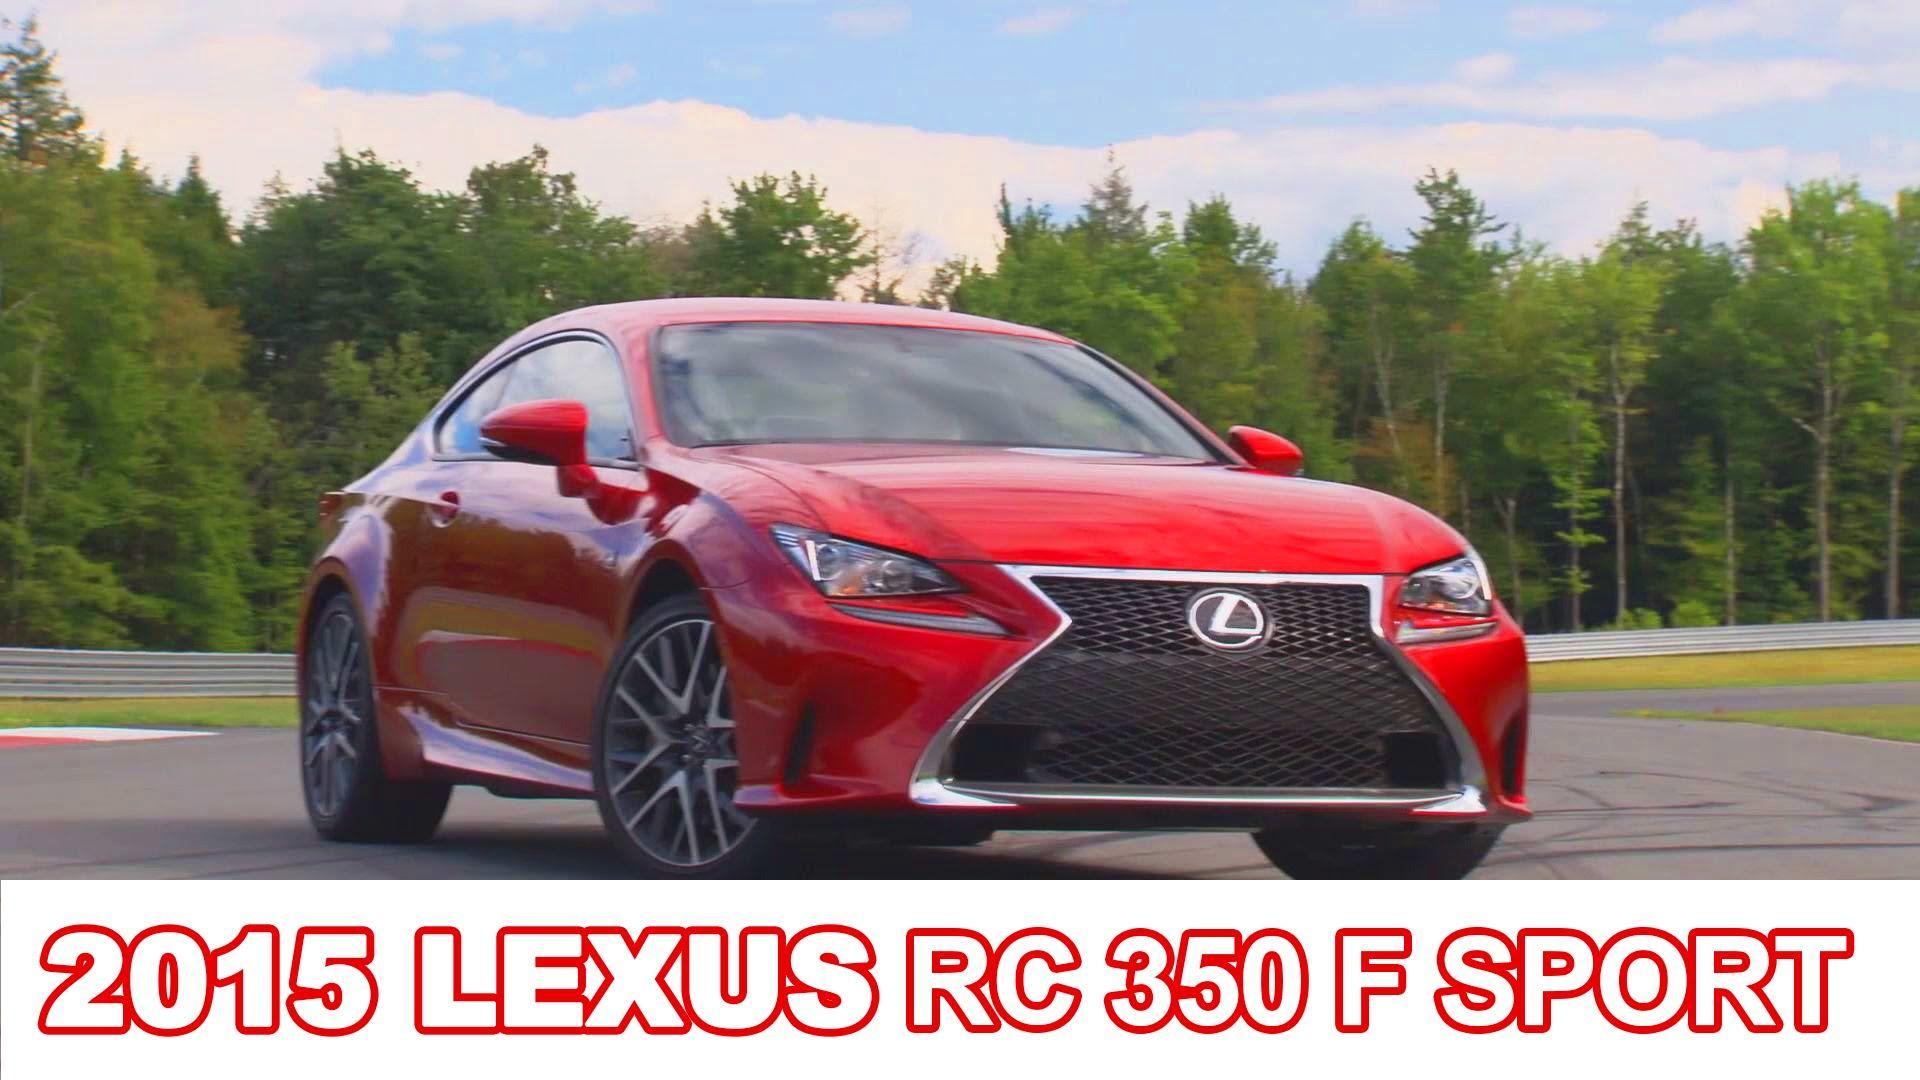 2015 Lexus RC 350 F SPORT Lexus, Luxury cars, Bmw